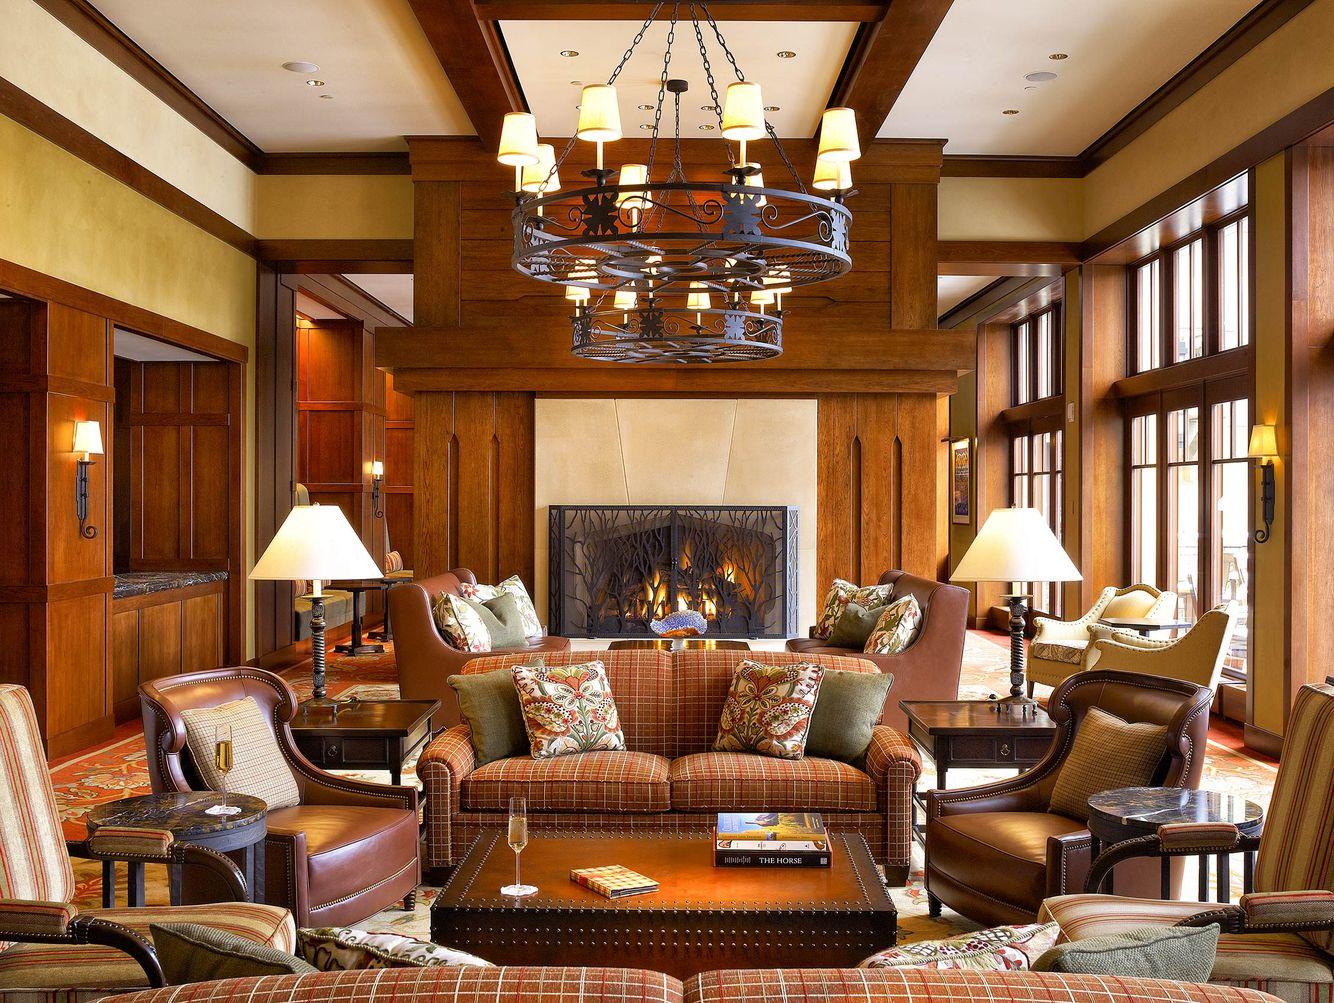 John-Sutton-Photography-Four Seasons Resort Lobby Lounge